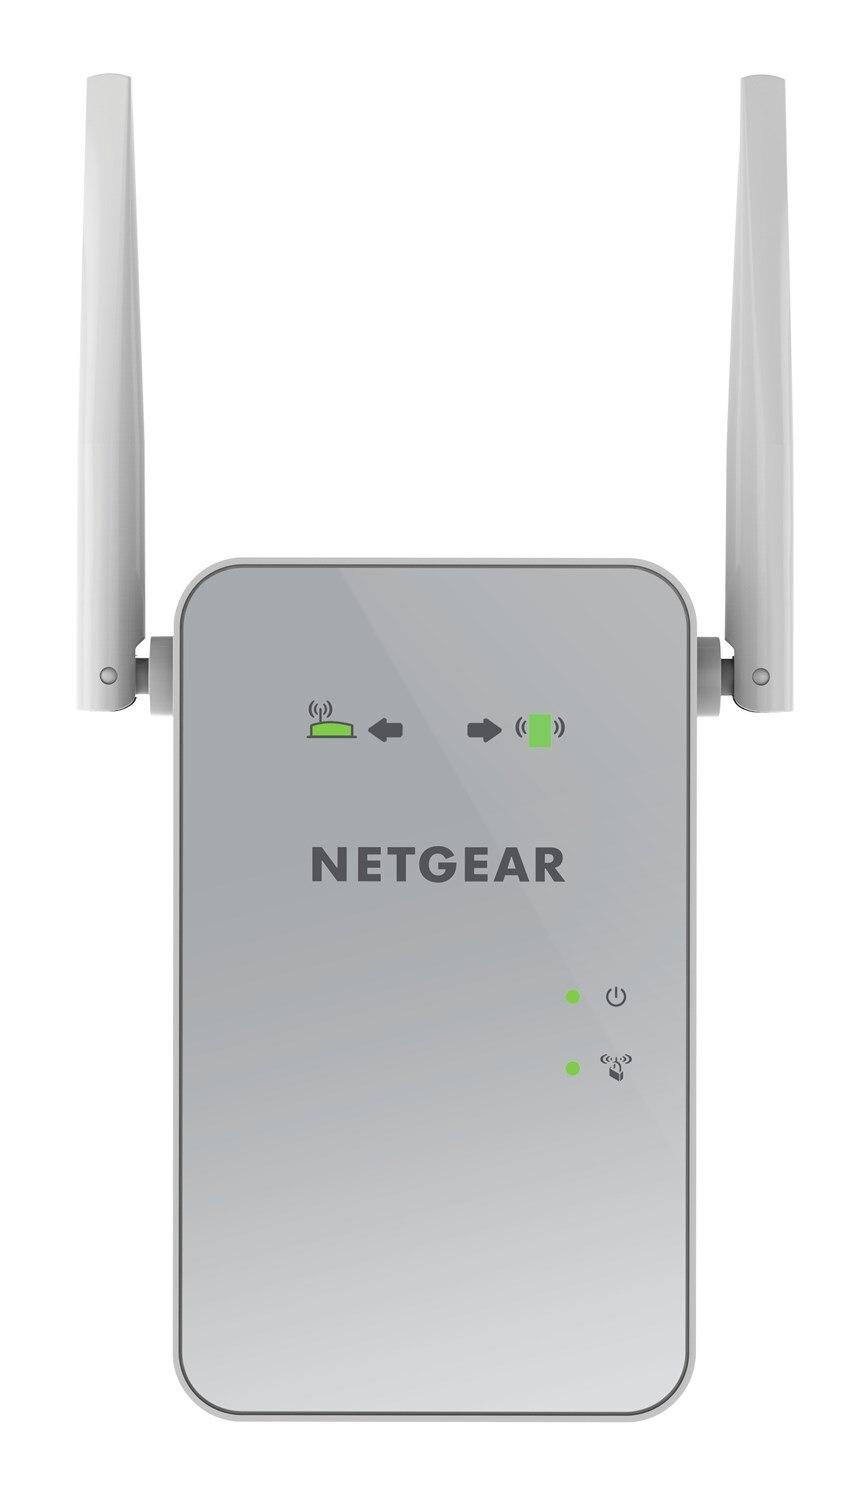 Netgear EX6150-100PES, 1000 Mbit/s, 10/100/1000Base-T (X),Netgear EX6150-100PES, 1000 Mbit/s, 10/100/1000Base-T (X),